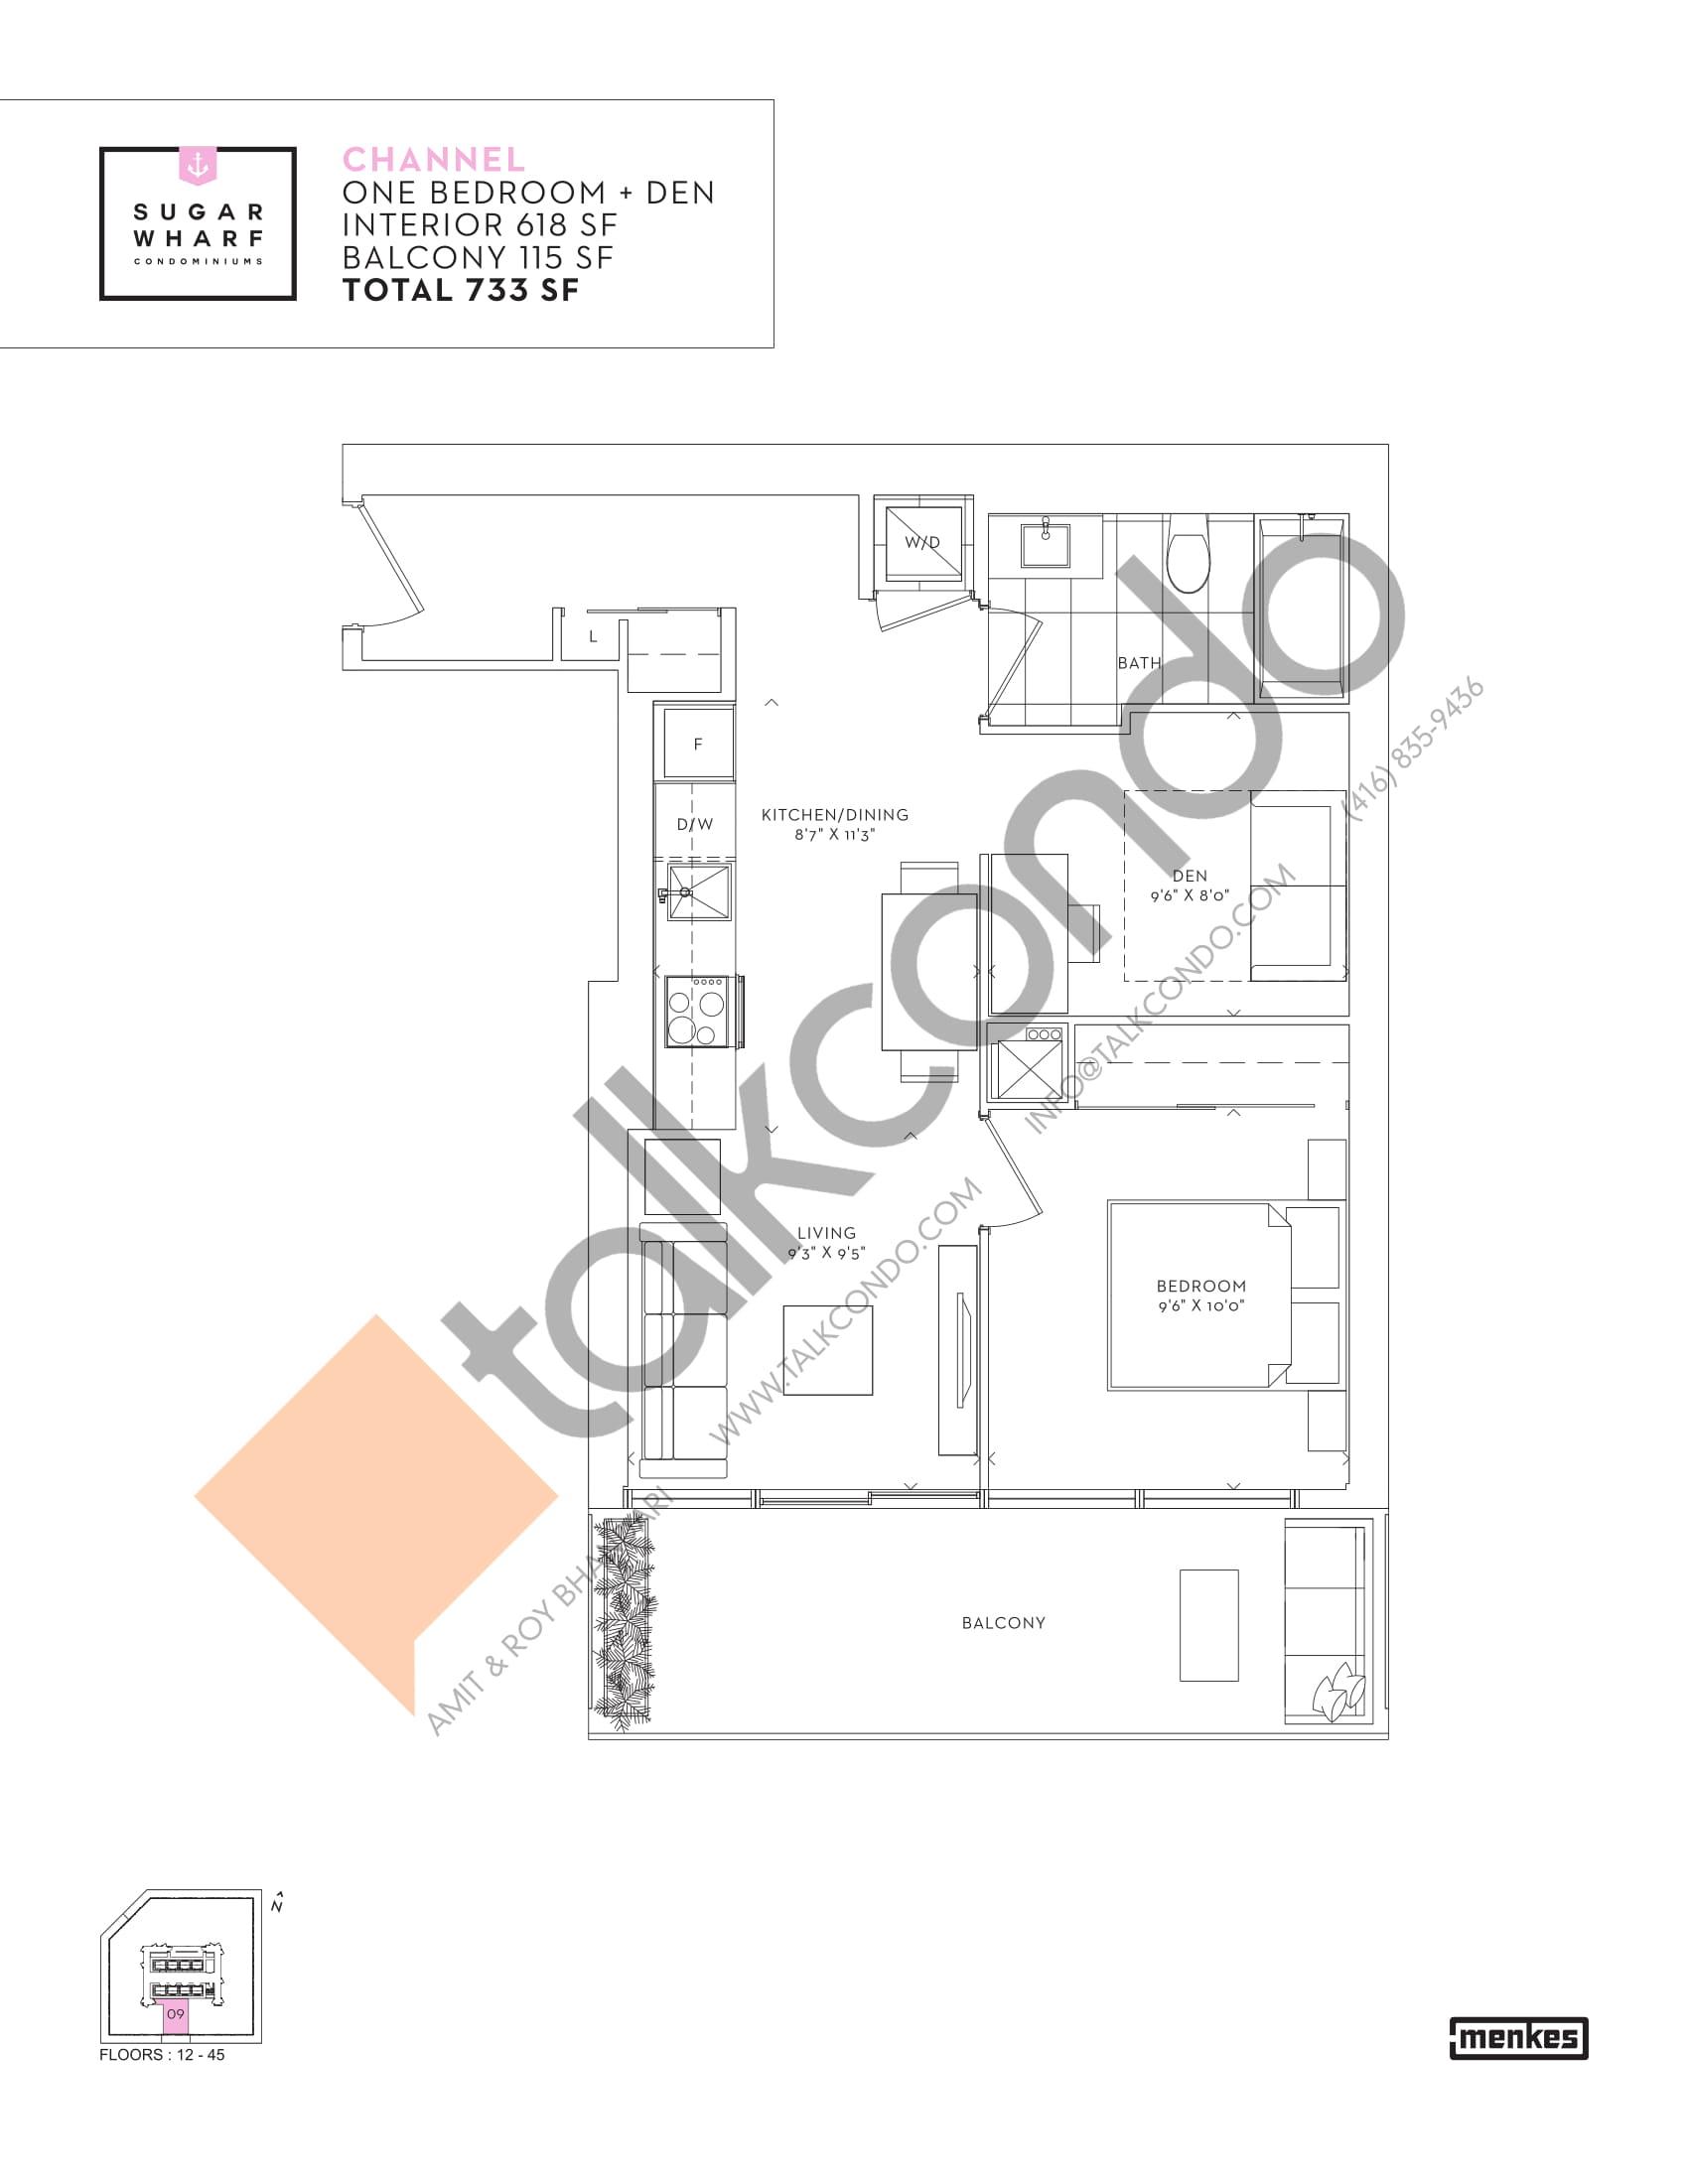 Channel Floor Plan at Sugar Wharf Condos East Tower - 618 sq.ft